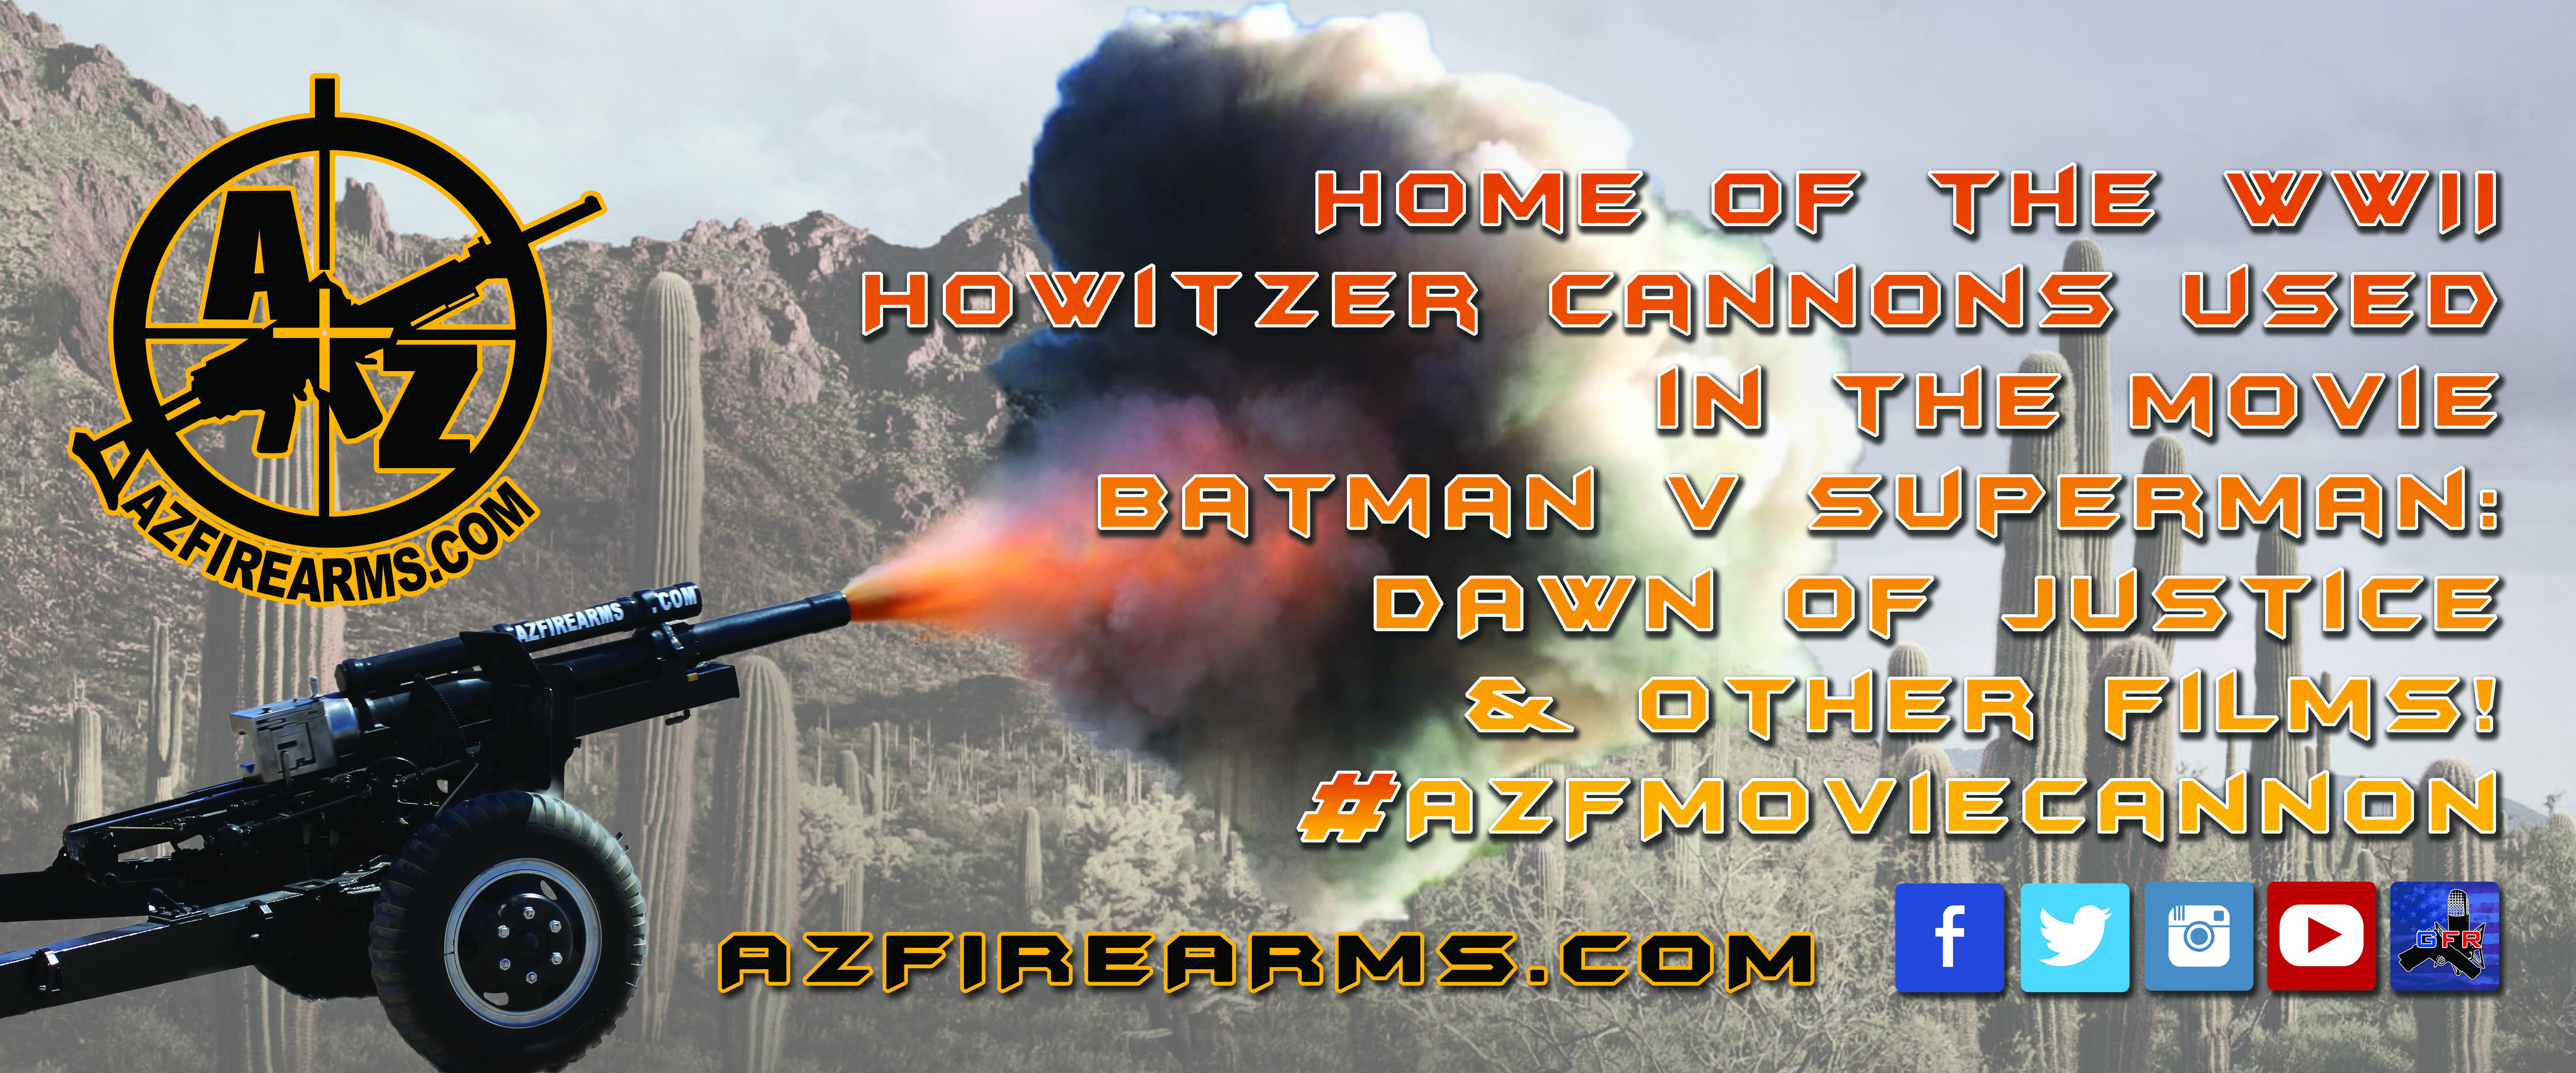 https://azfirearms.com/movie-gun-rentals-at-azfirearms-com/